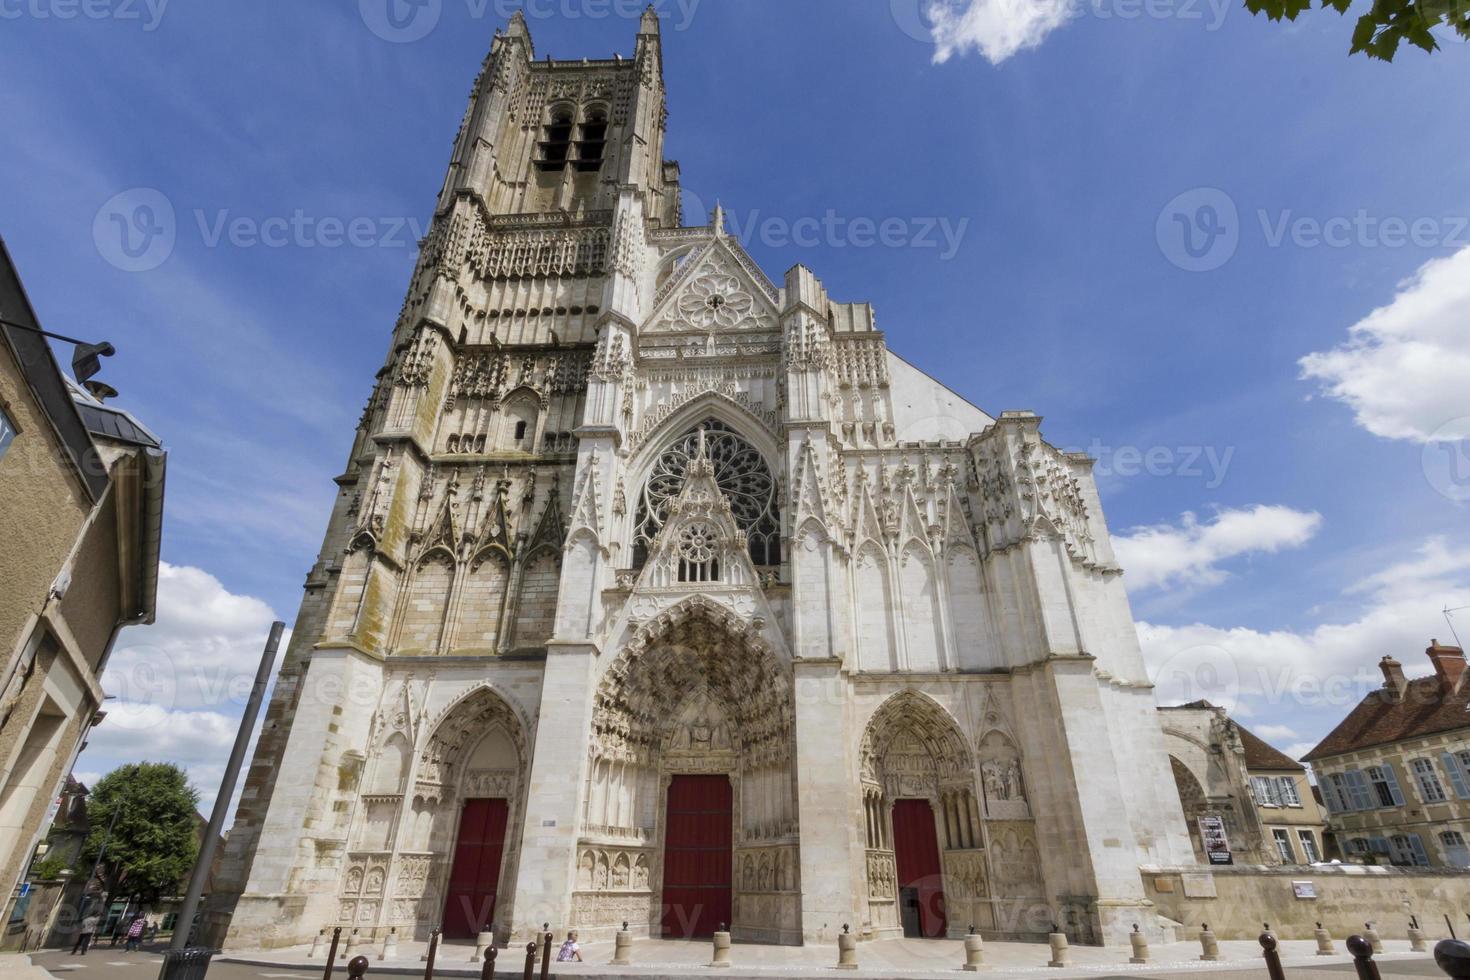 cattedrale di st. etienne, auxerre, francia. foto